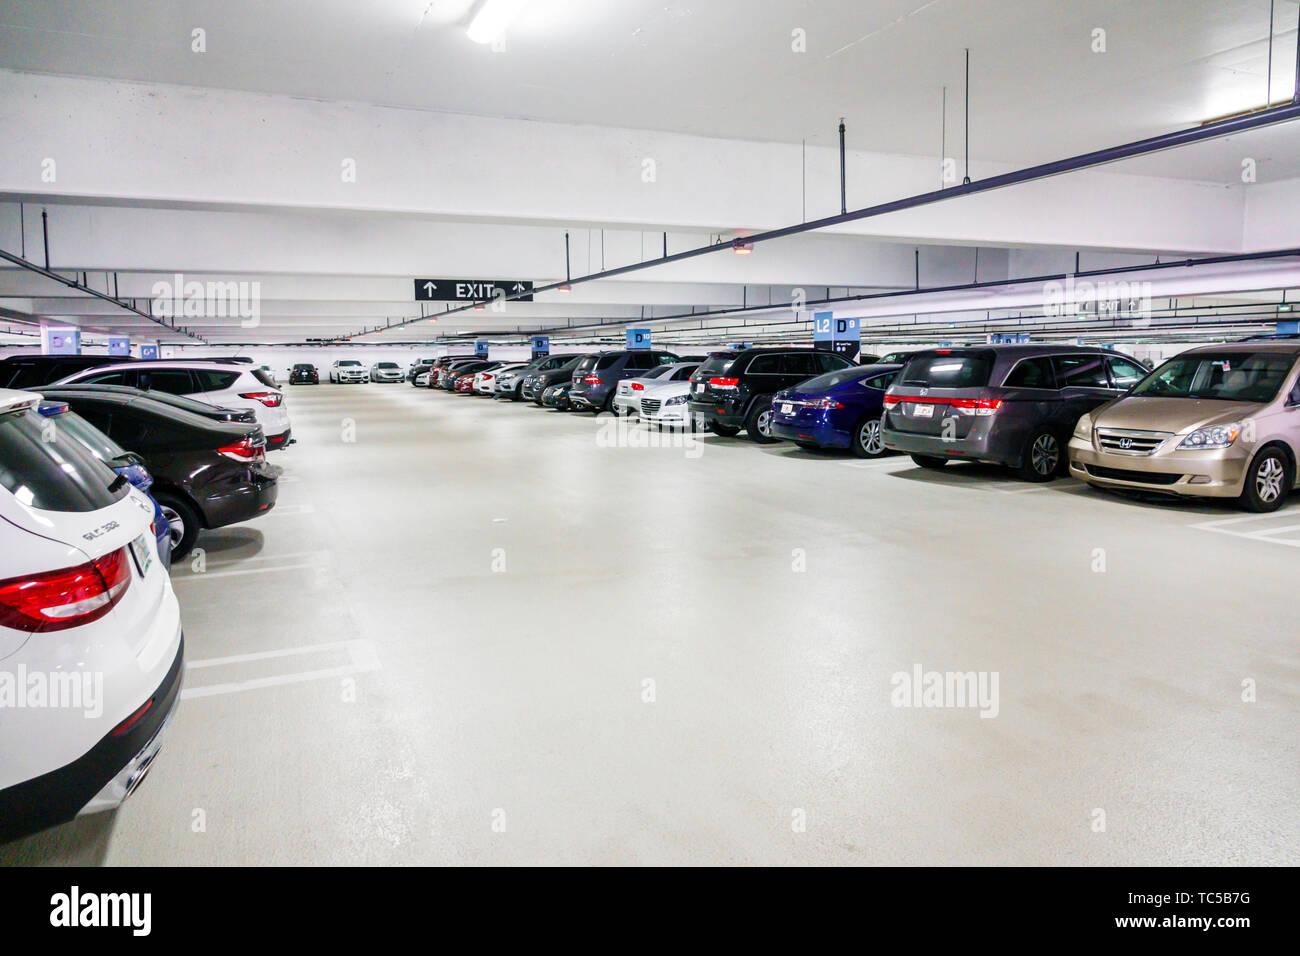 Miami Florida Midtown public parking garage interior parked cars vehicles exit sign - Stock Image